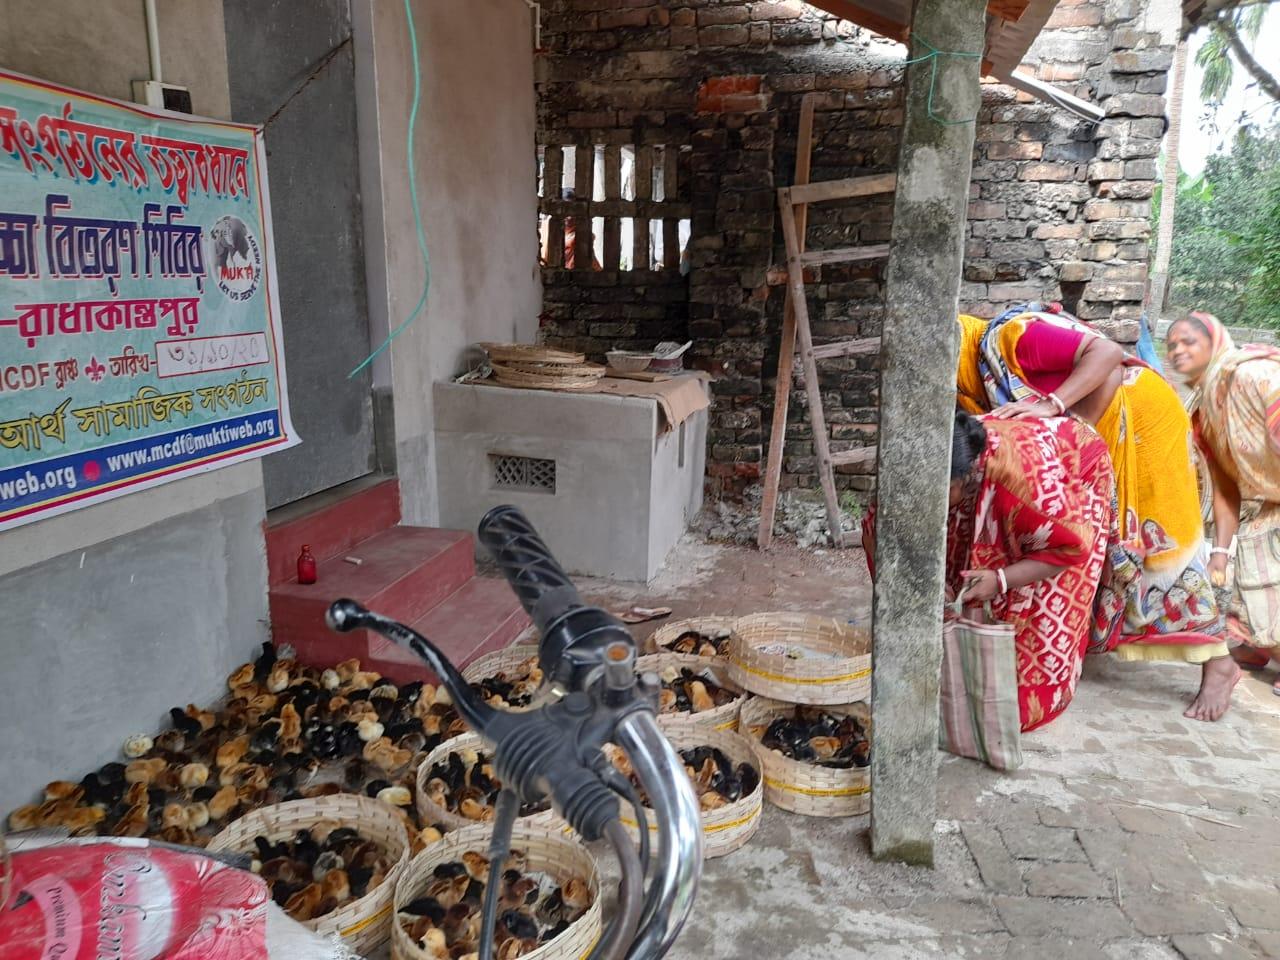 Mukti Distributed Chicks To The Mcdf Members Of Radhakantapur Branch